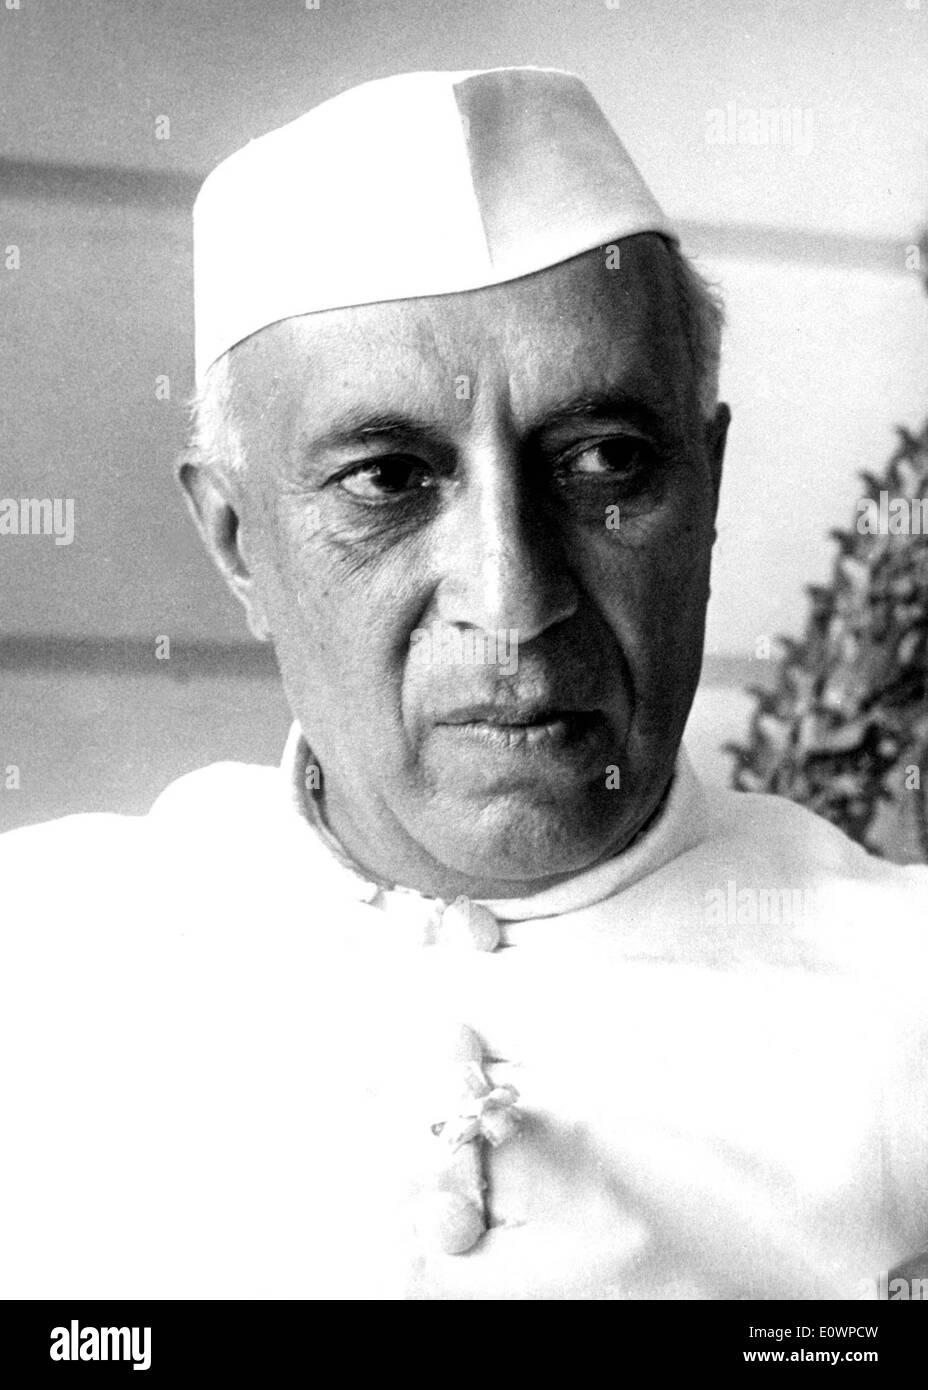 Close-up of Prime Minister of India Jawaharlal Nehru - Stock Image